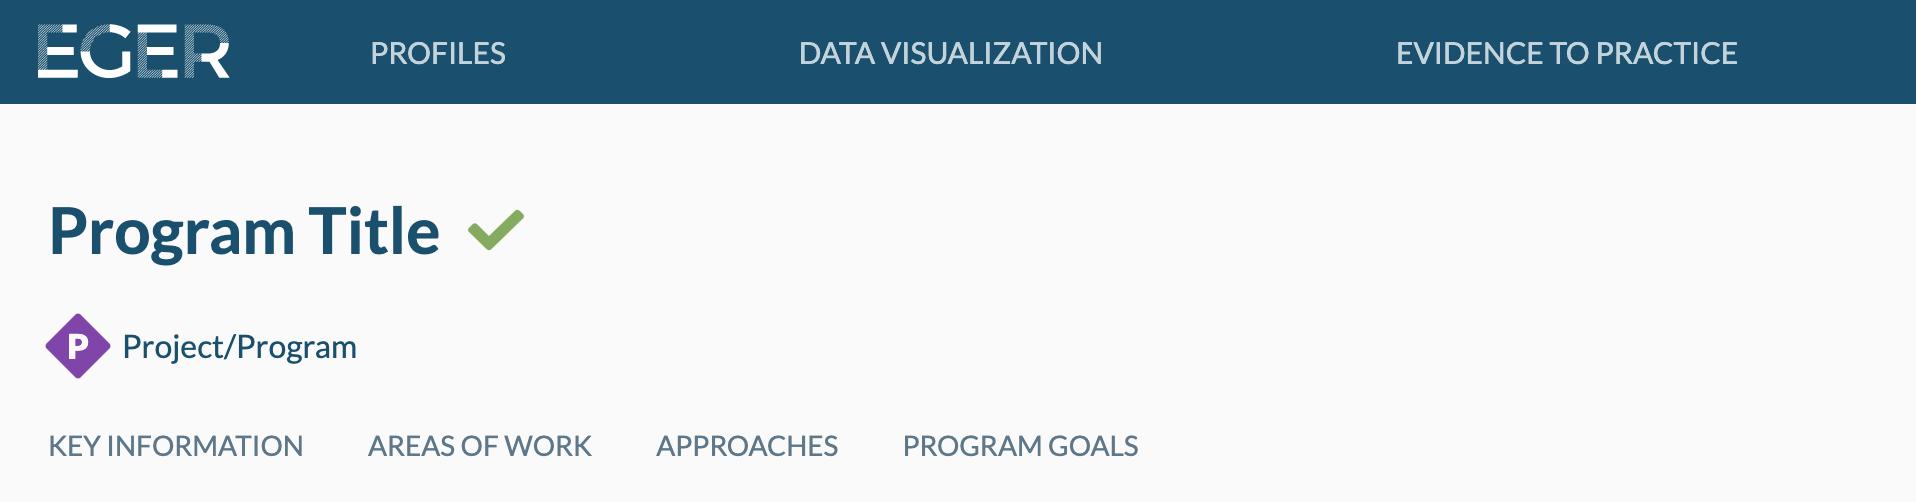 Image of program profile header